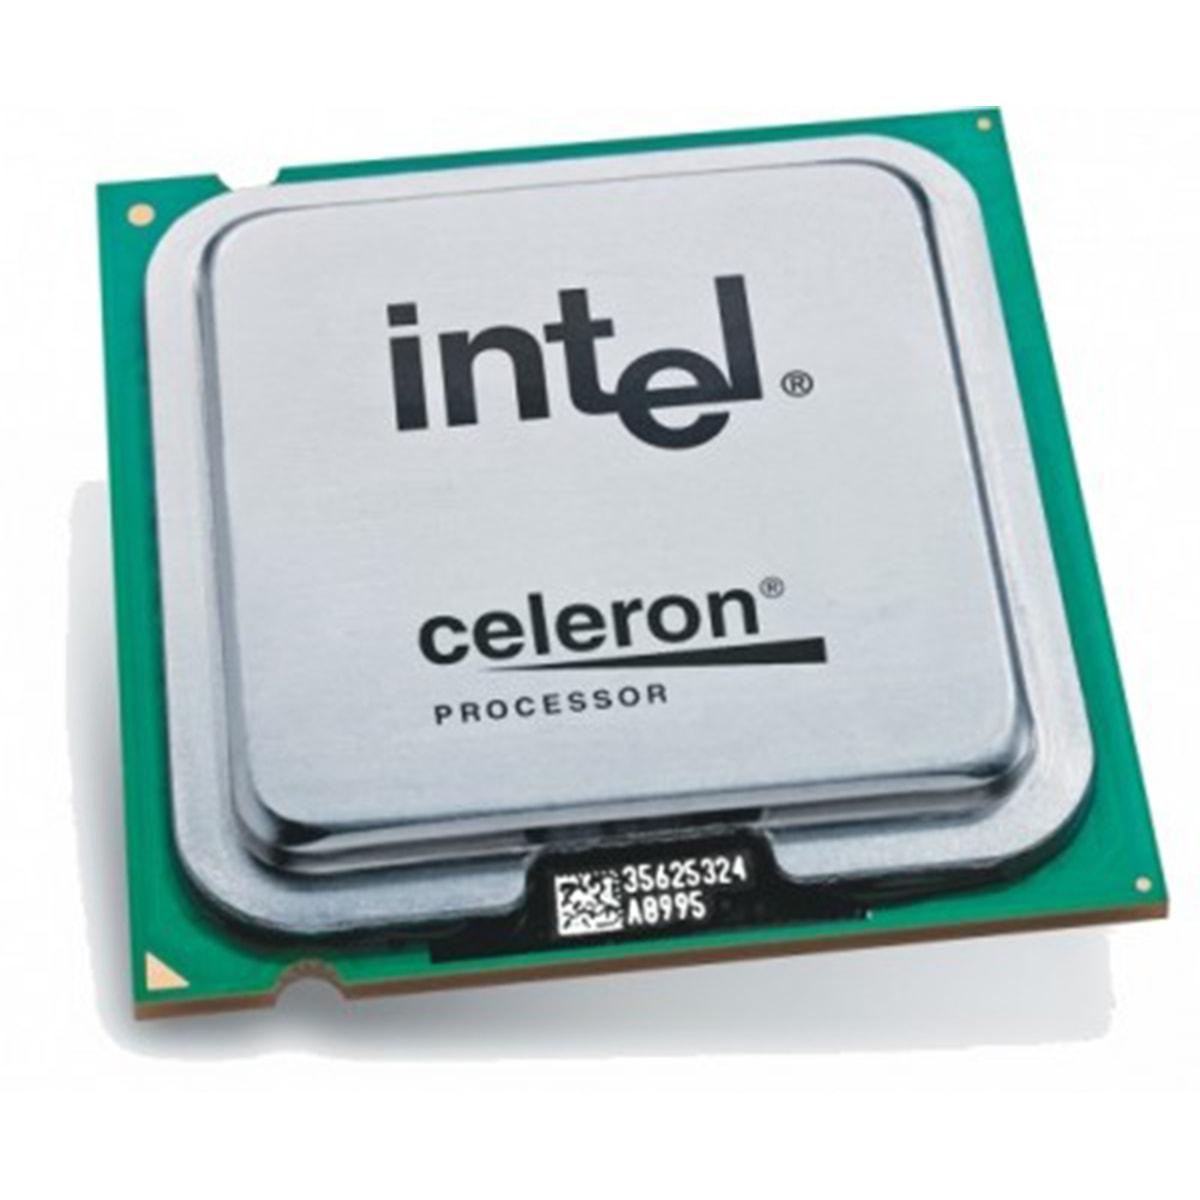 Processador Intel Celeron D 336 2,80Ghz 256Kb Cache 533MHz - Socket 775 - Seminovo